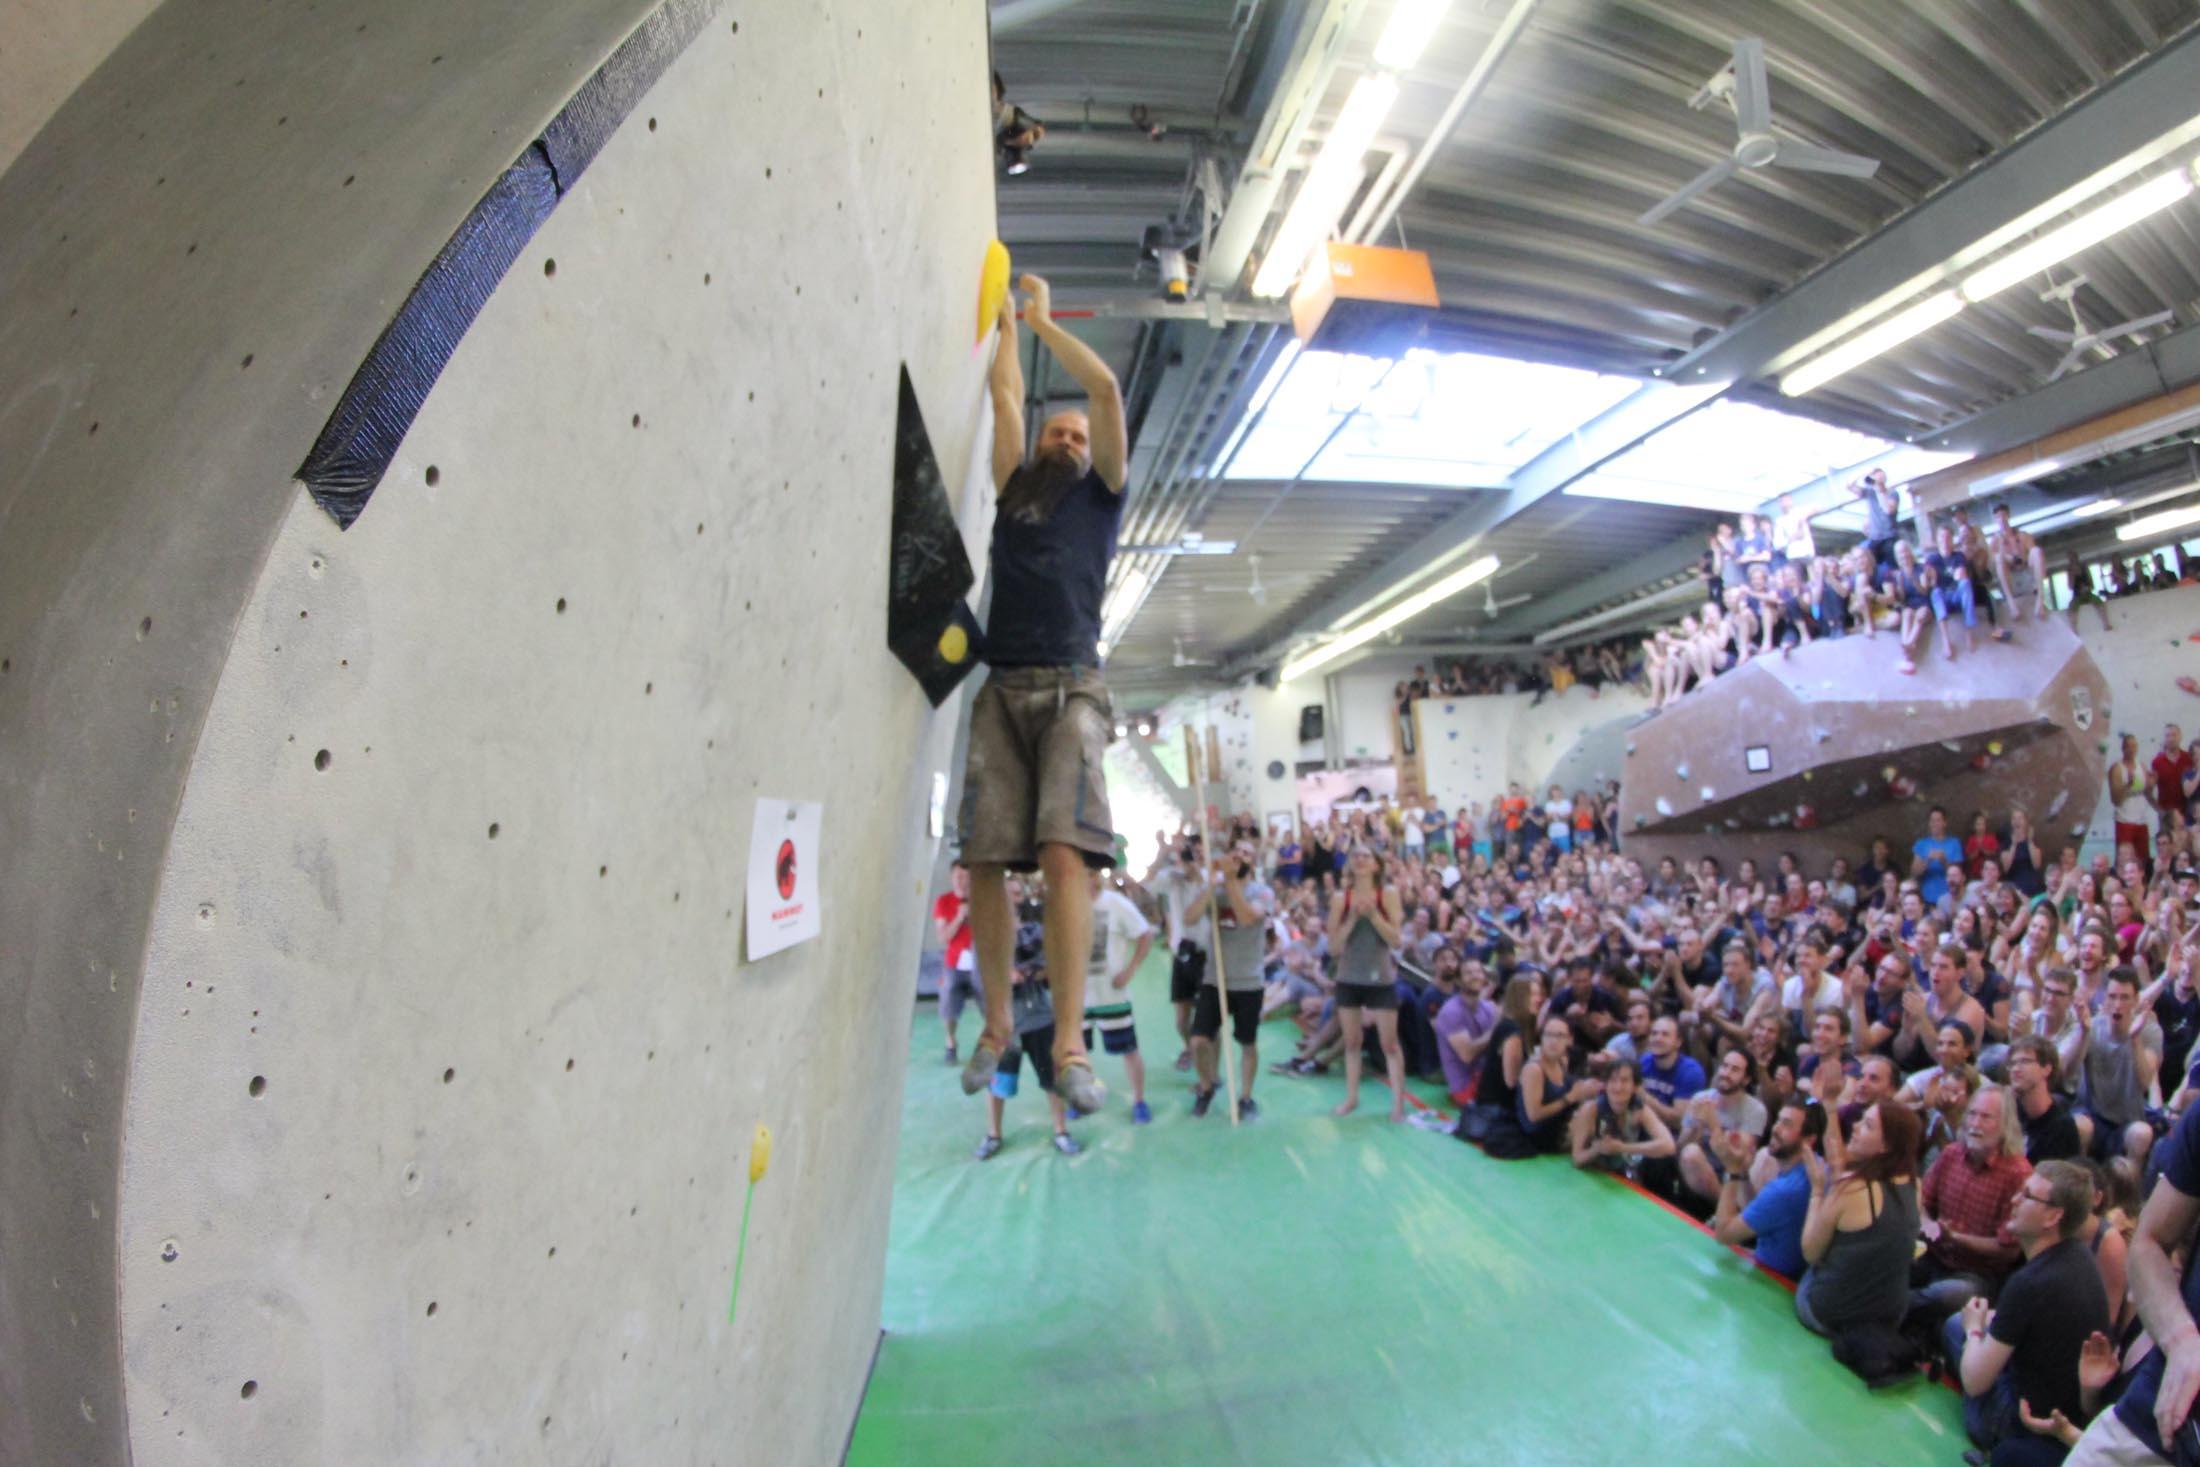 Finale, internationaler bouldercup Frankenjura 2016, BLOCKHELDEN Erlangen, Mammut, Bergfreunde.de, Boulderwettkampf07092016553